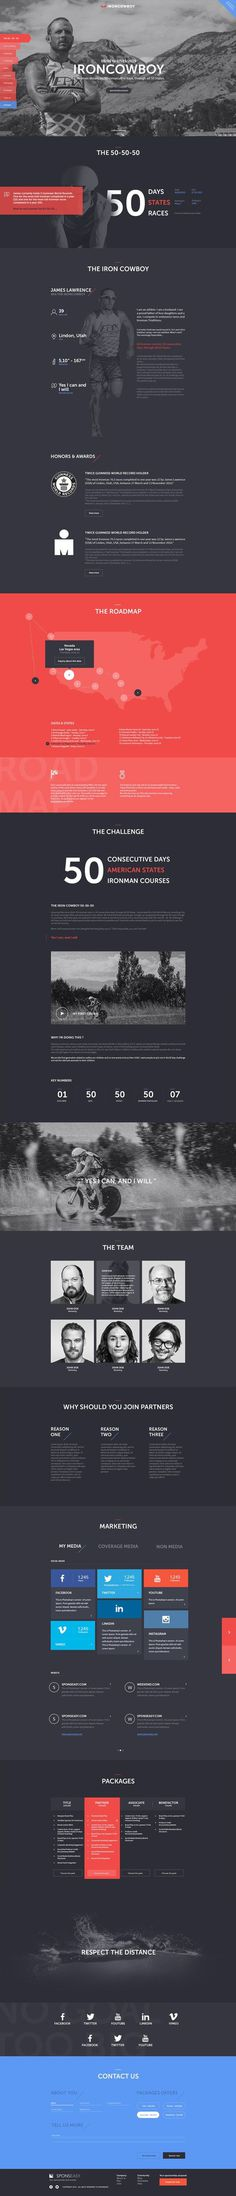 Ironman by Barthelemy Chalvet